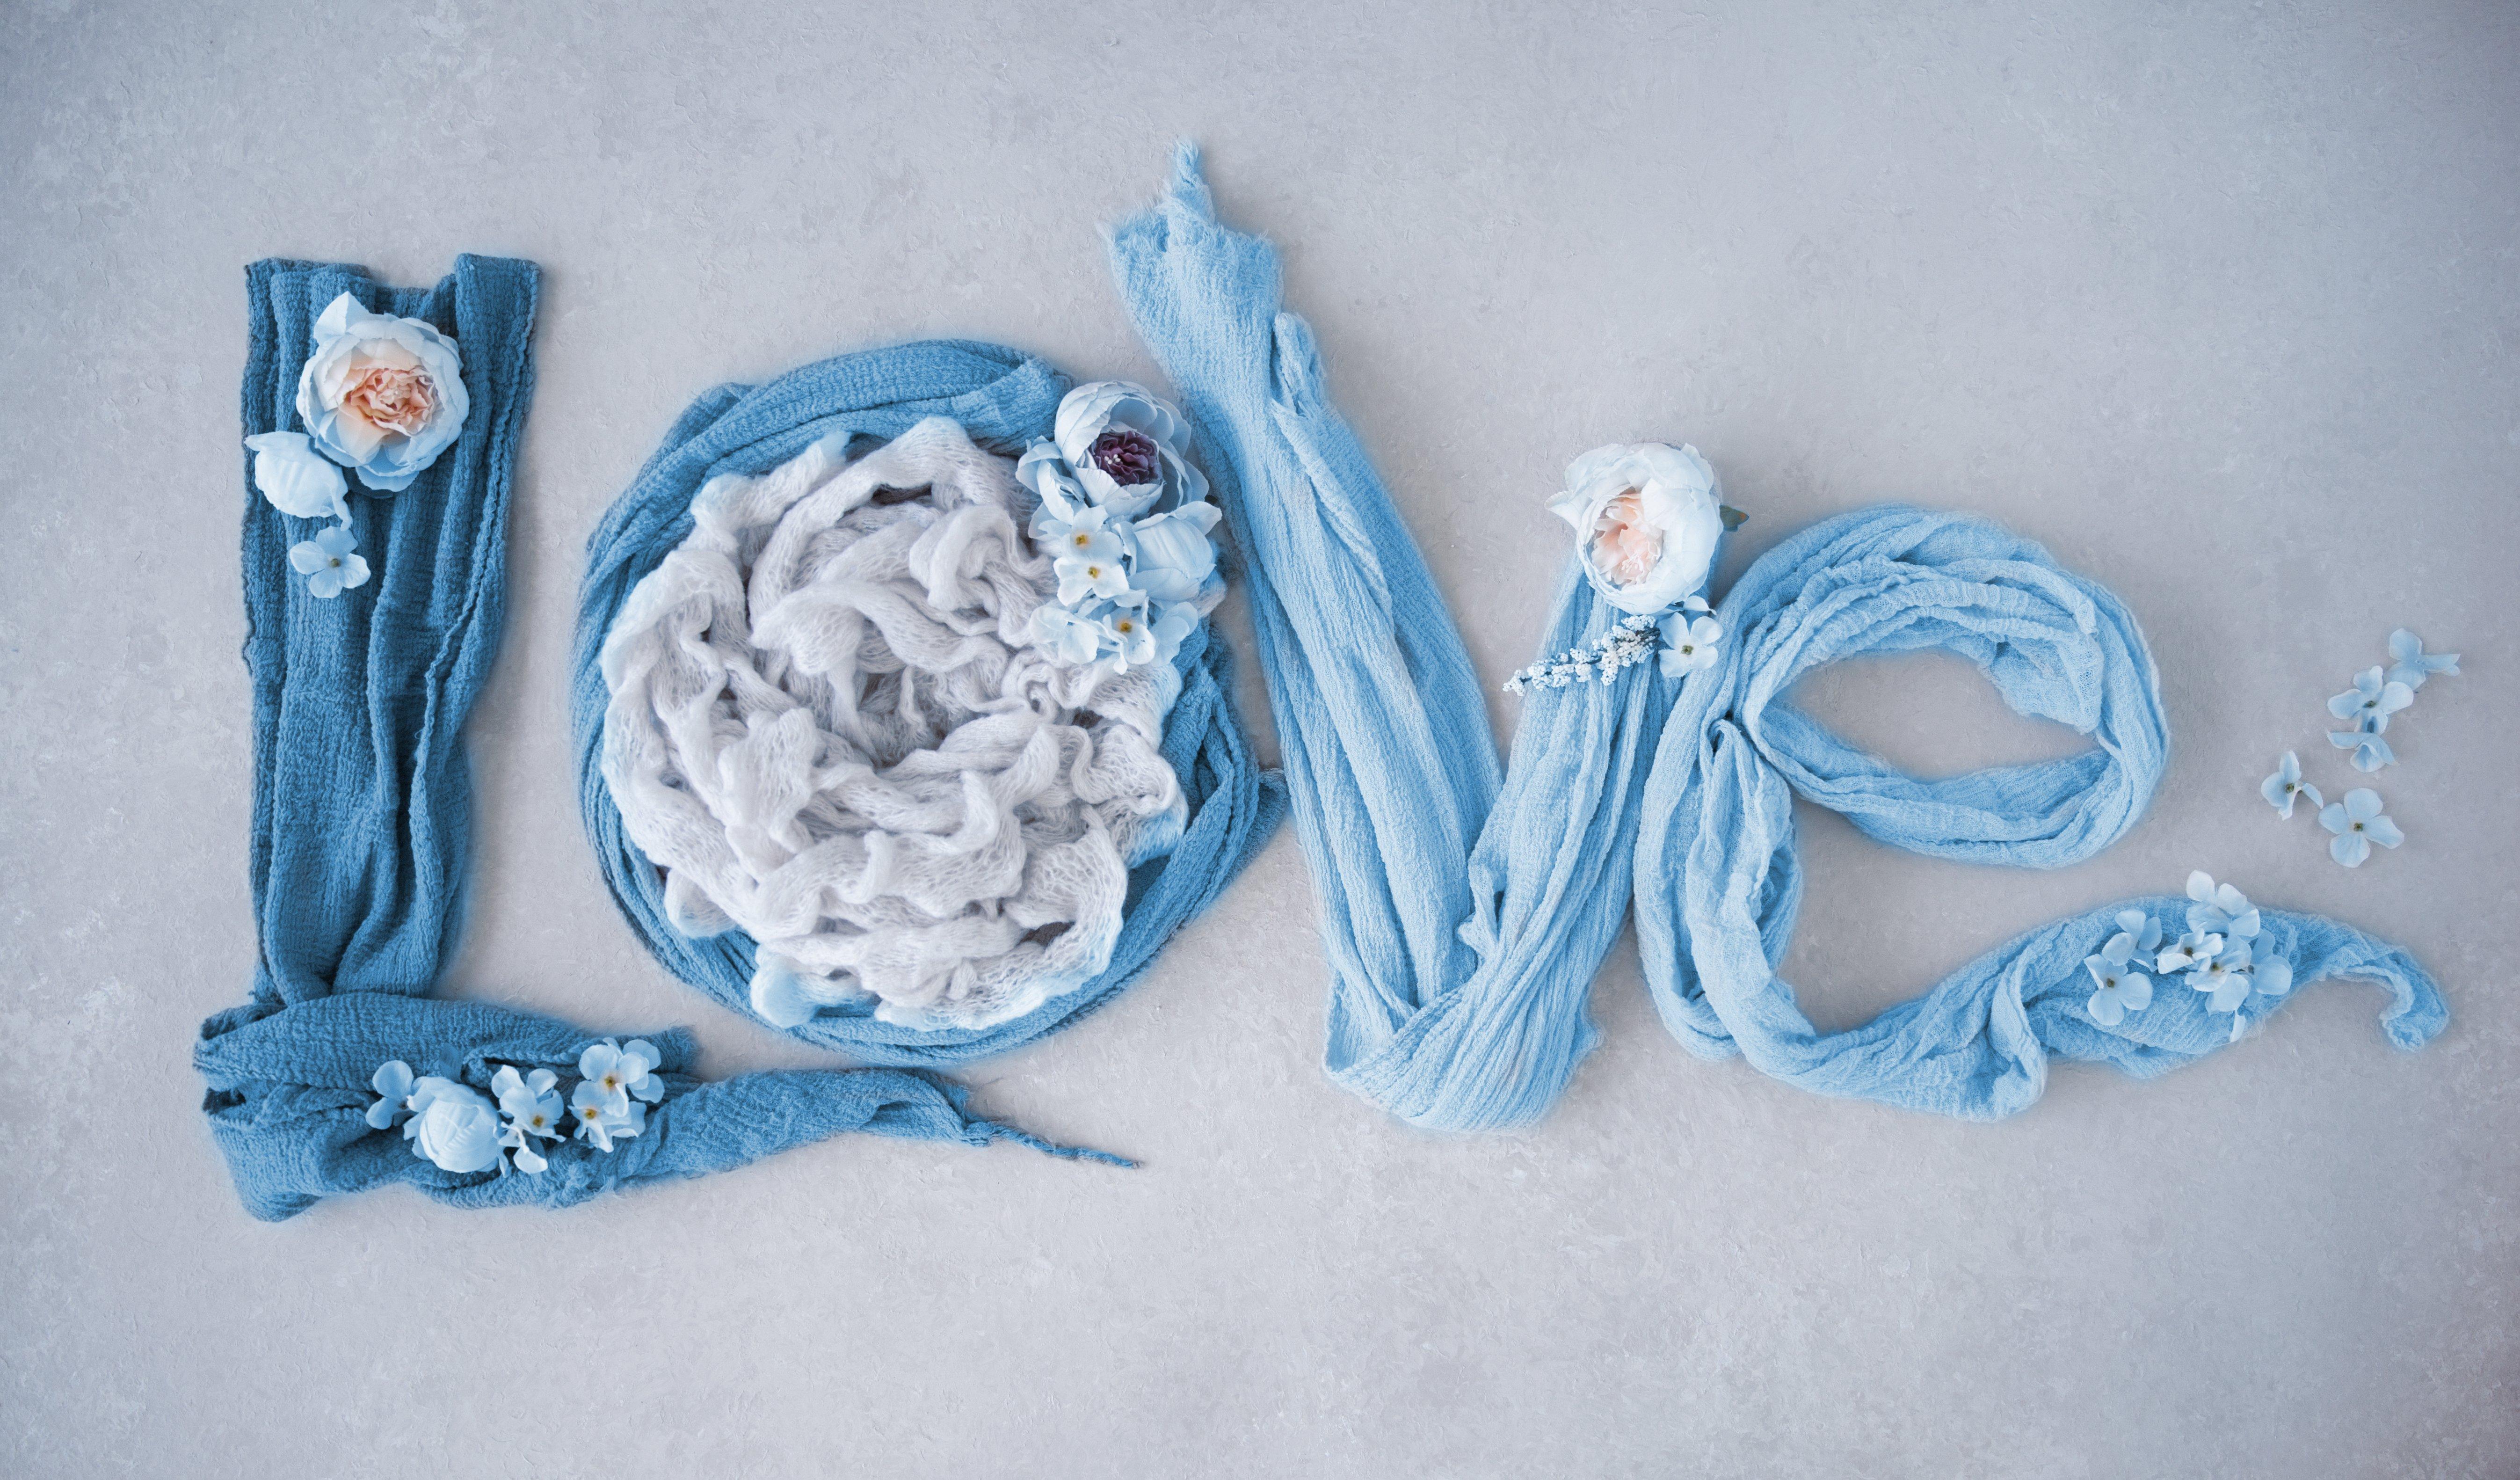 COOL BLUE LOVE NEST (DIGITAL)